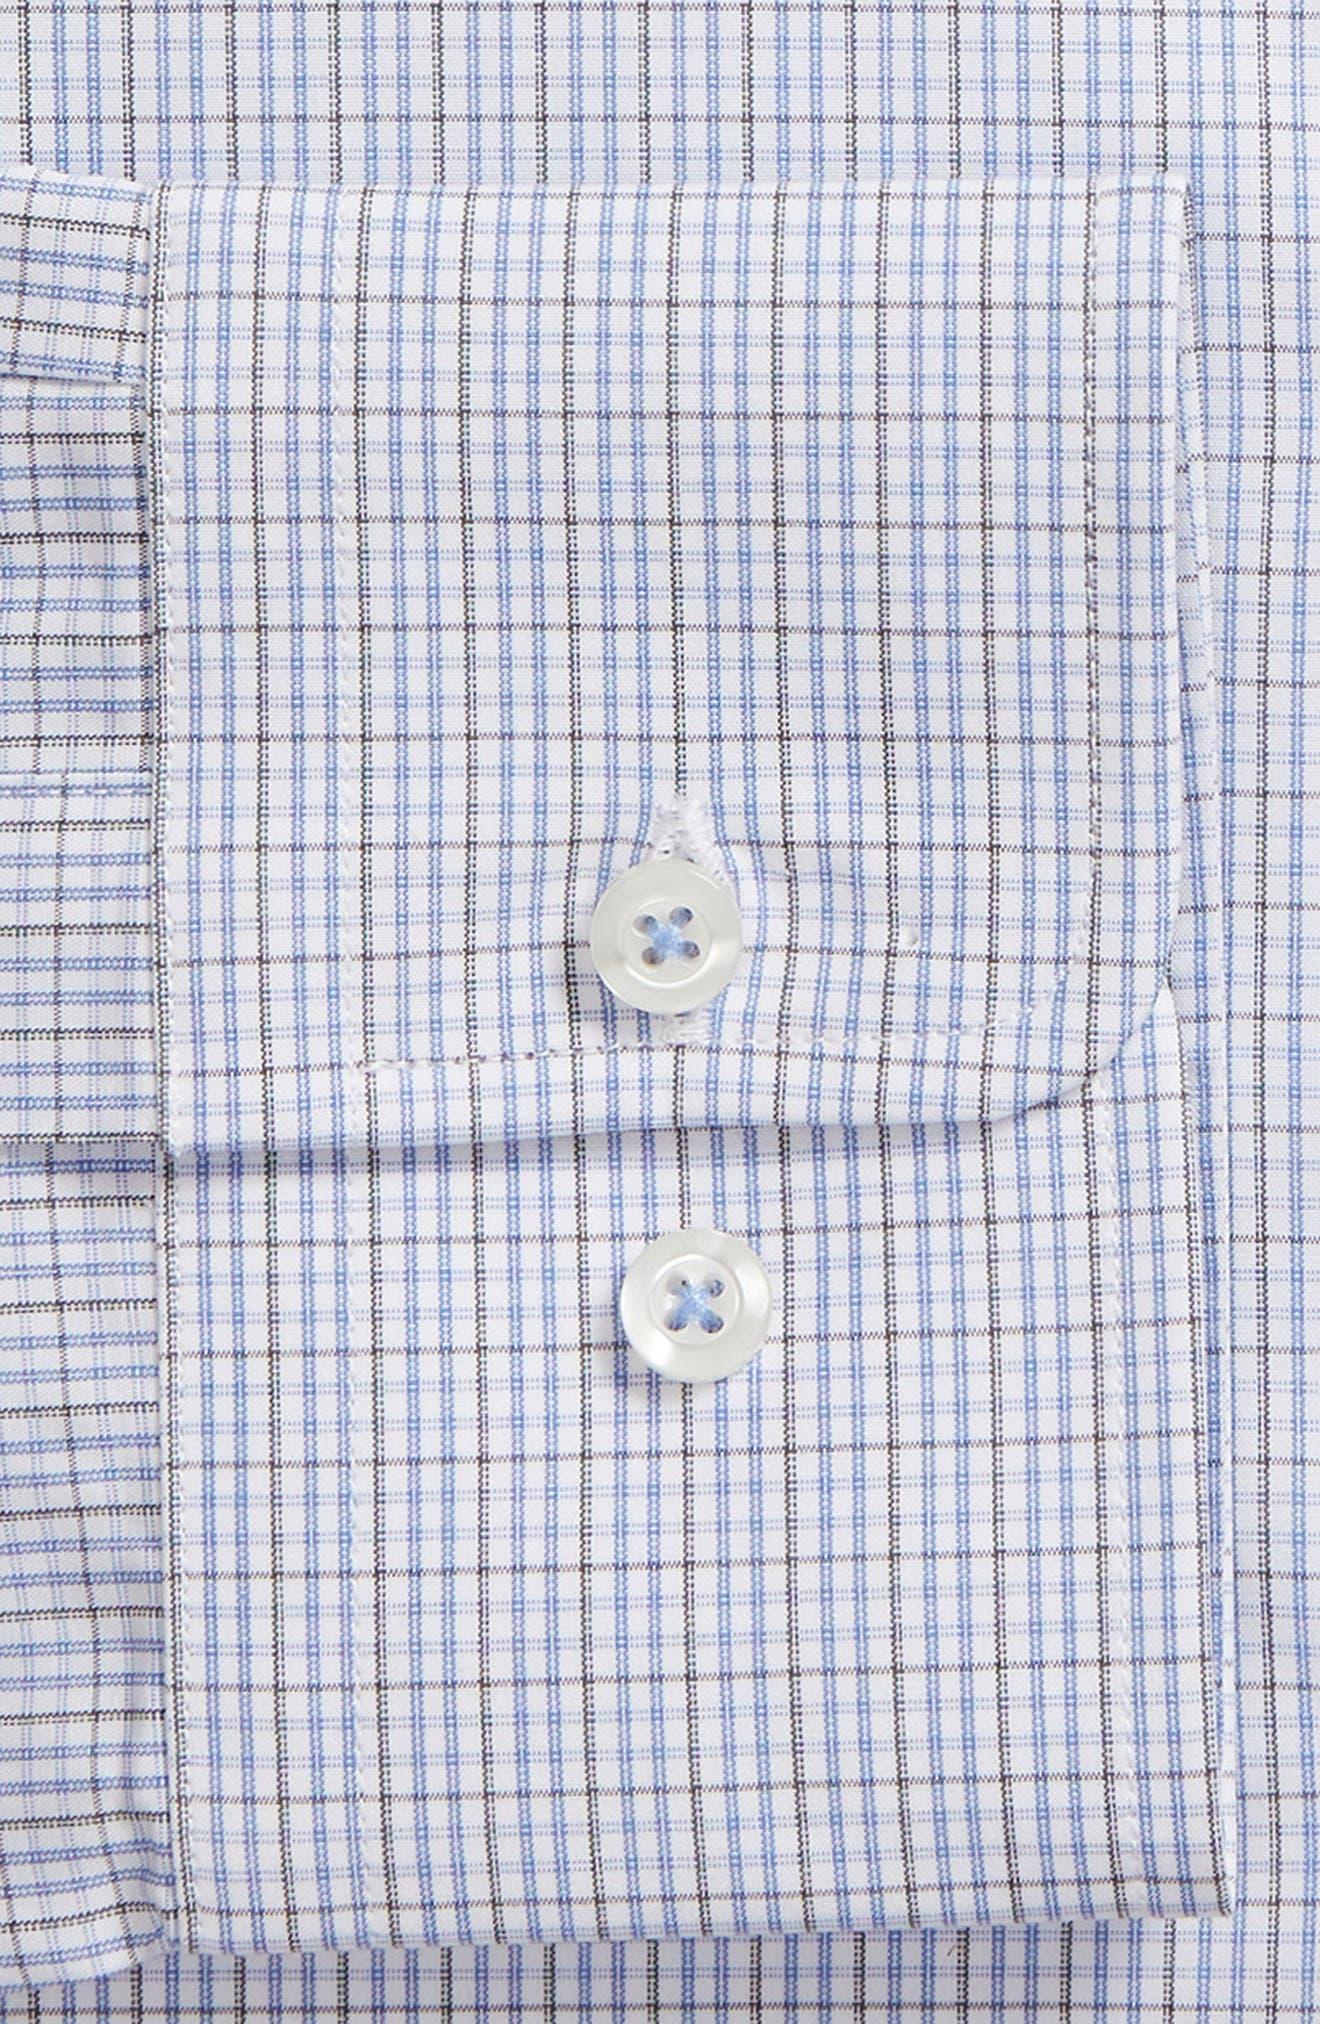 Regular Fit Check Dress Shirt,                             Alternate thumbnail 6, color,                             020